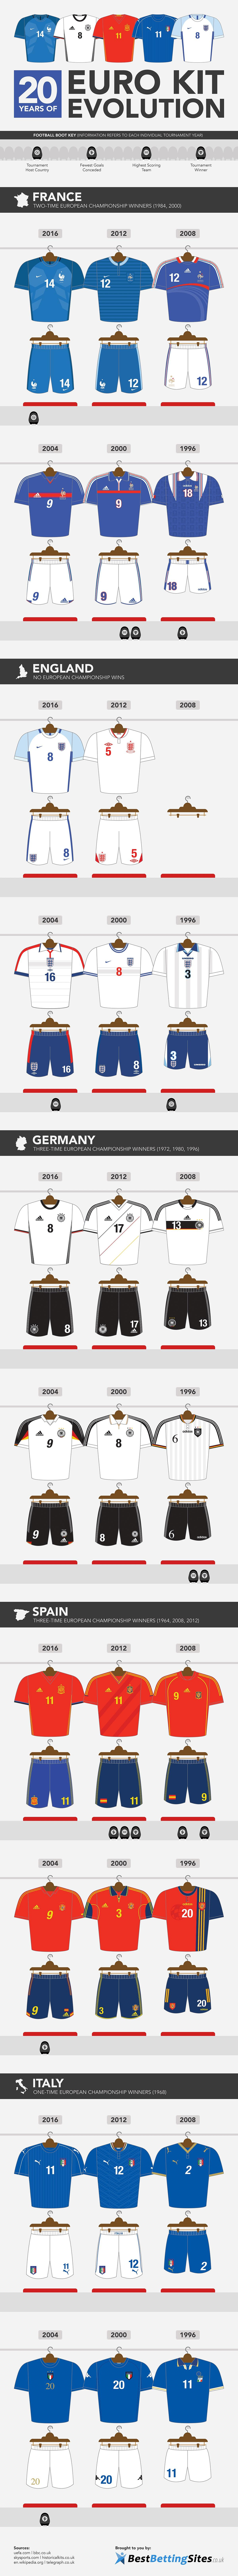 20-Years-of-Euro-Kit-Evolution